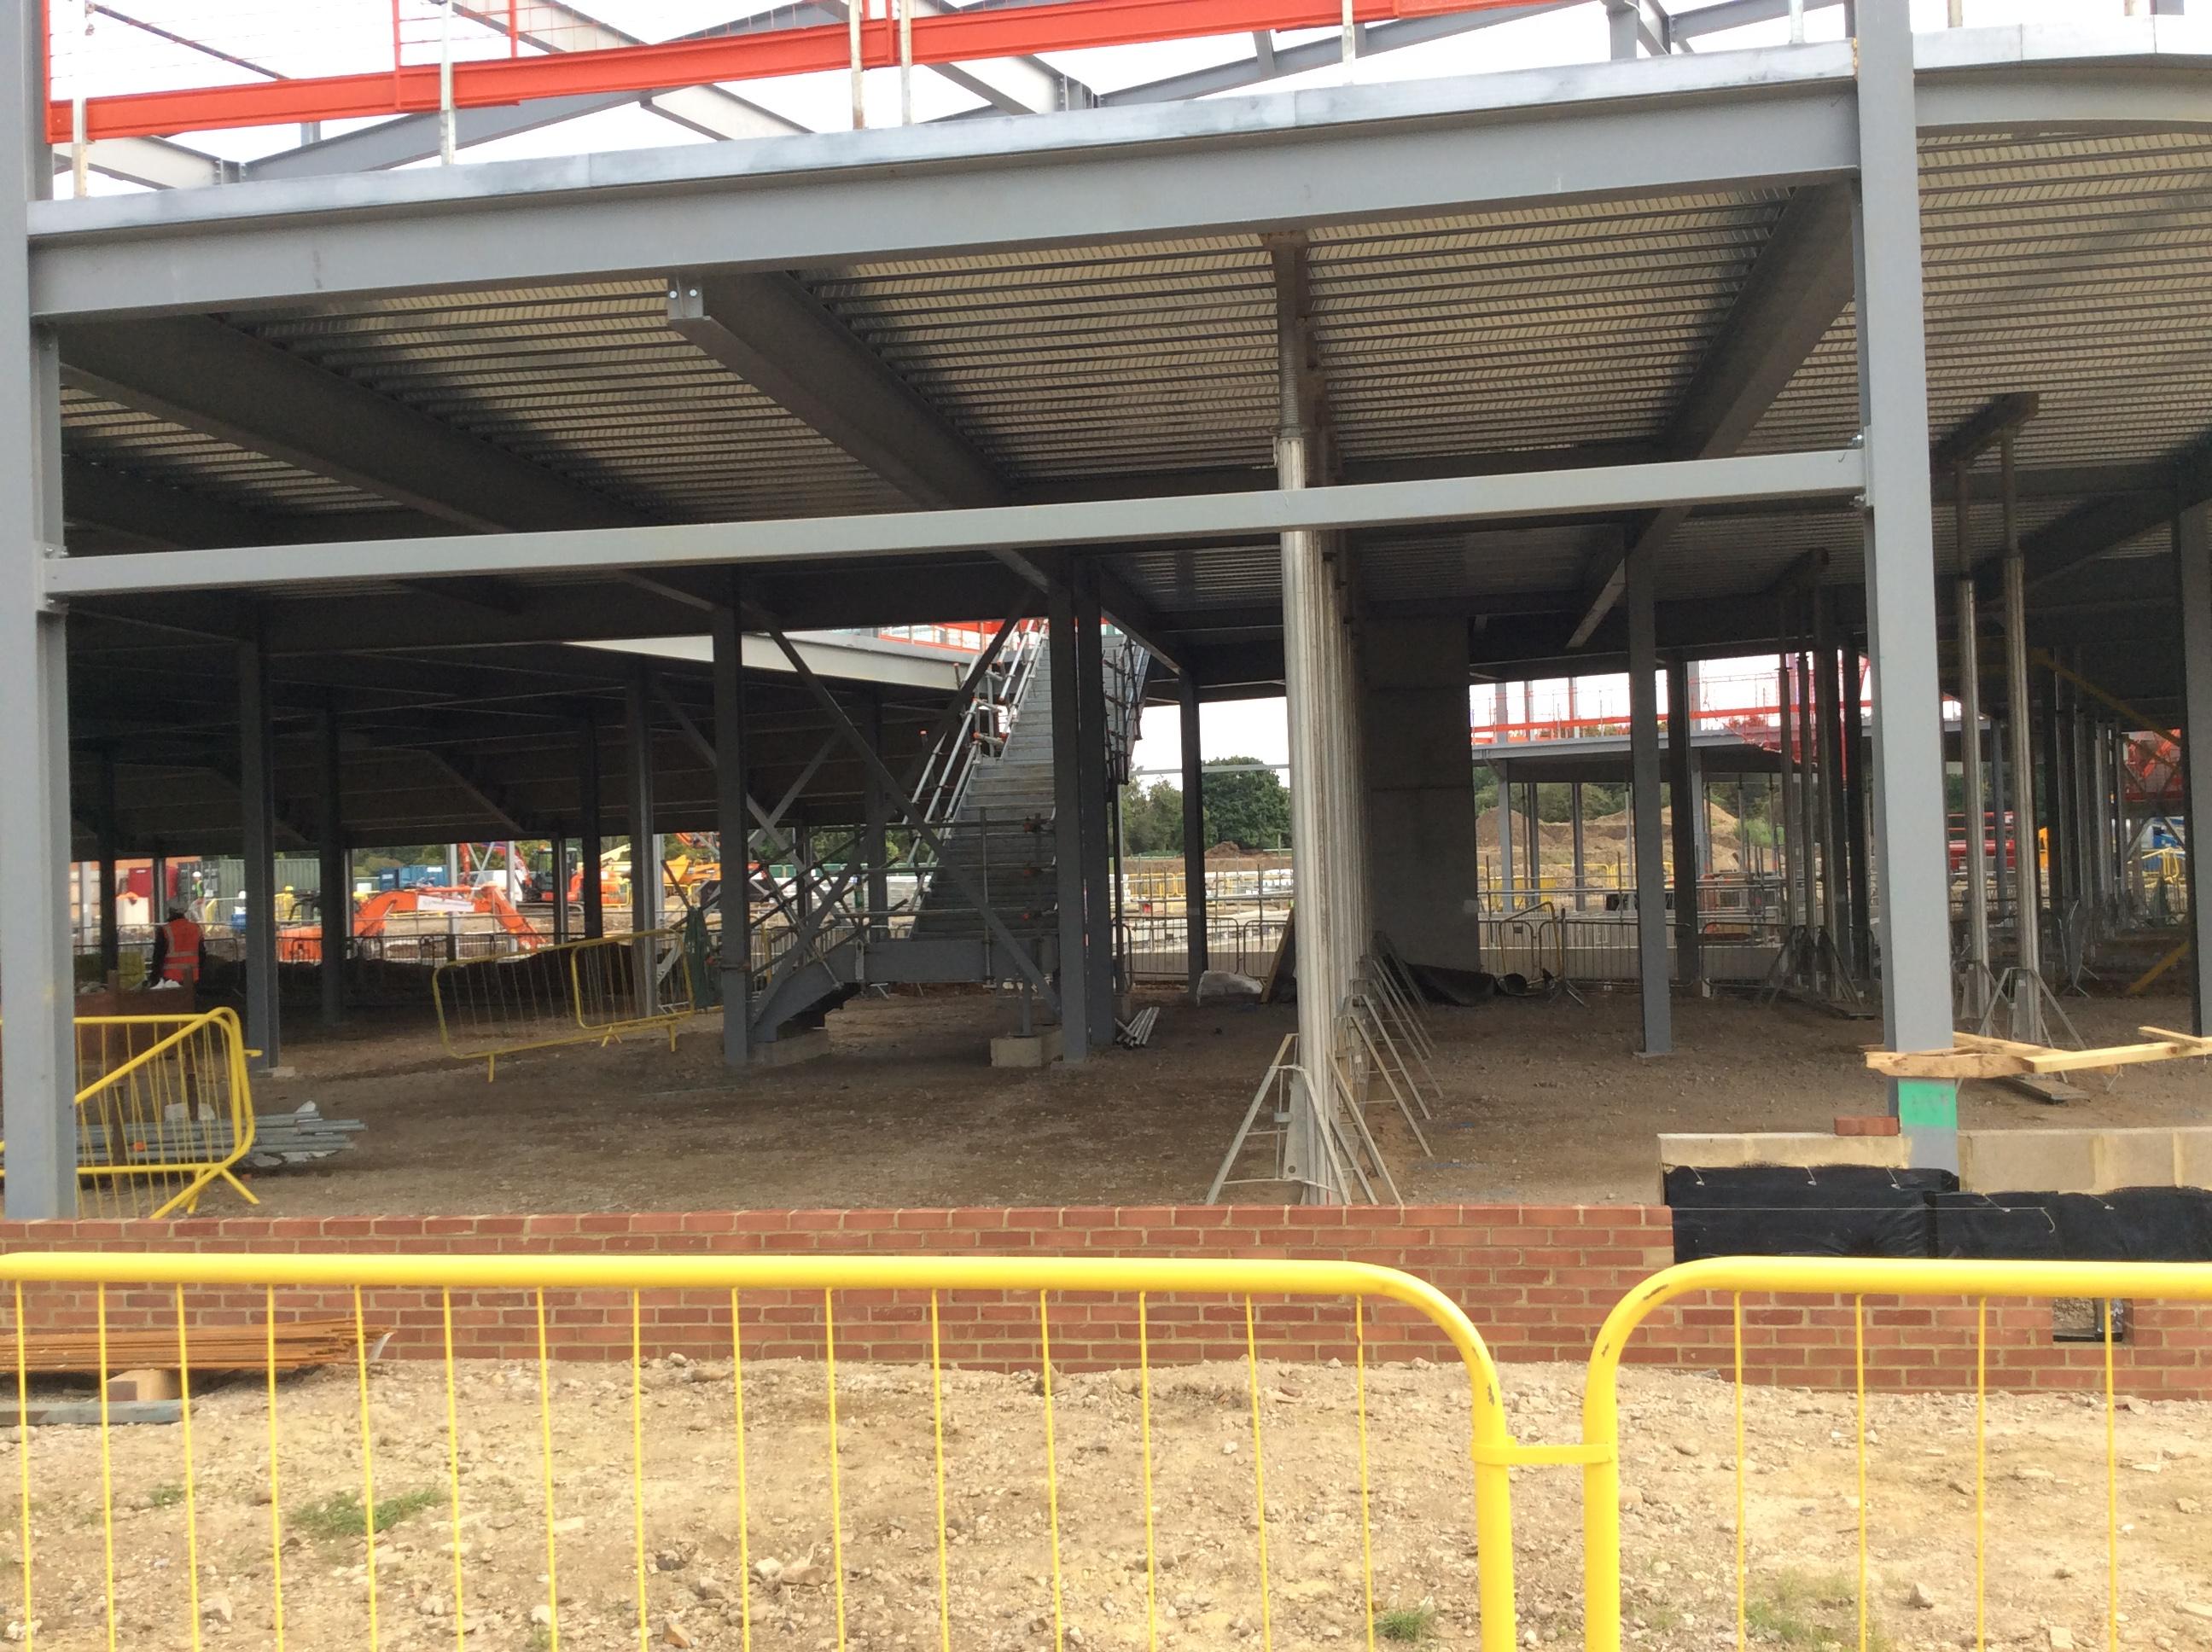 Grange Paddocks - 11.09.2020 - start of the brick work